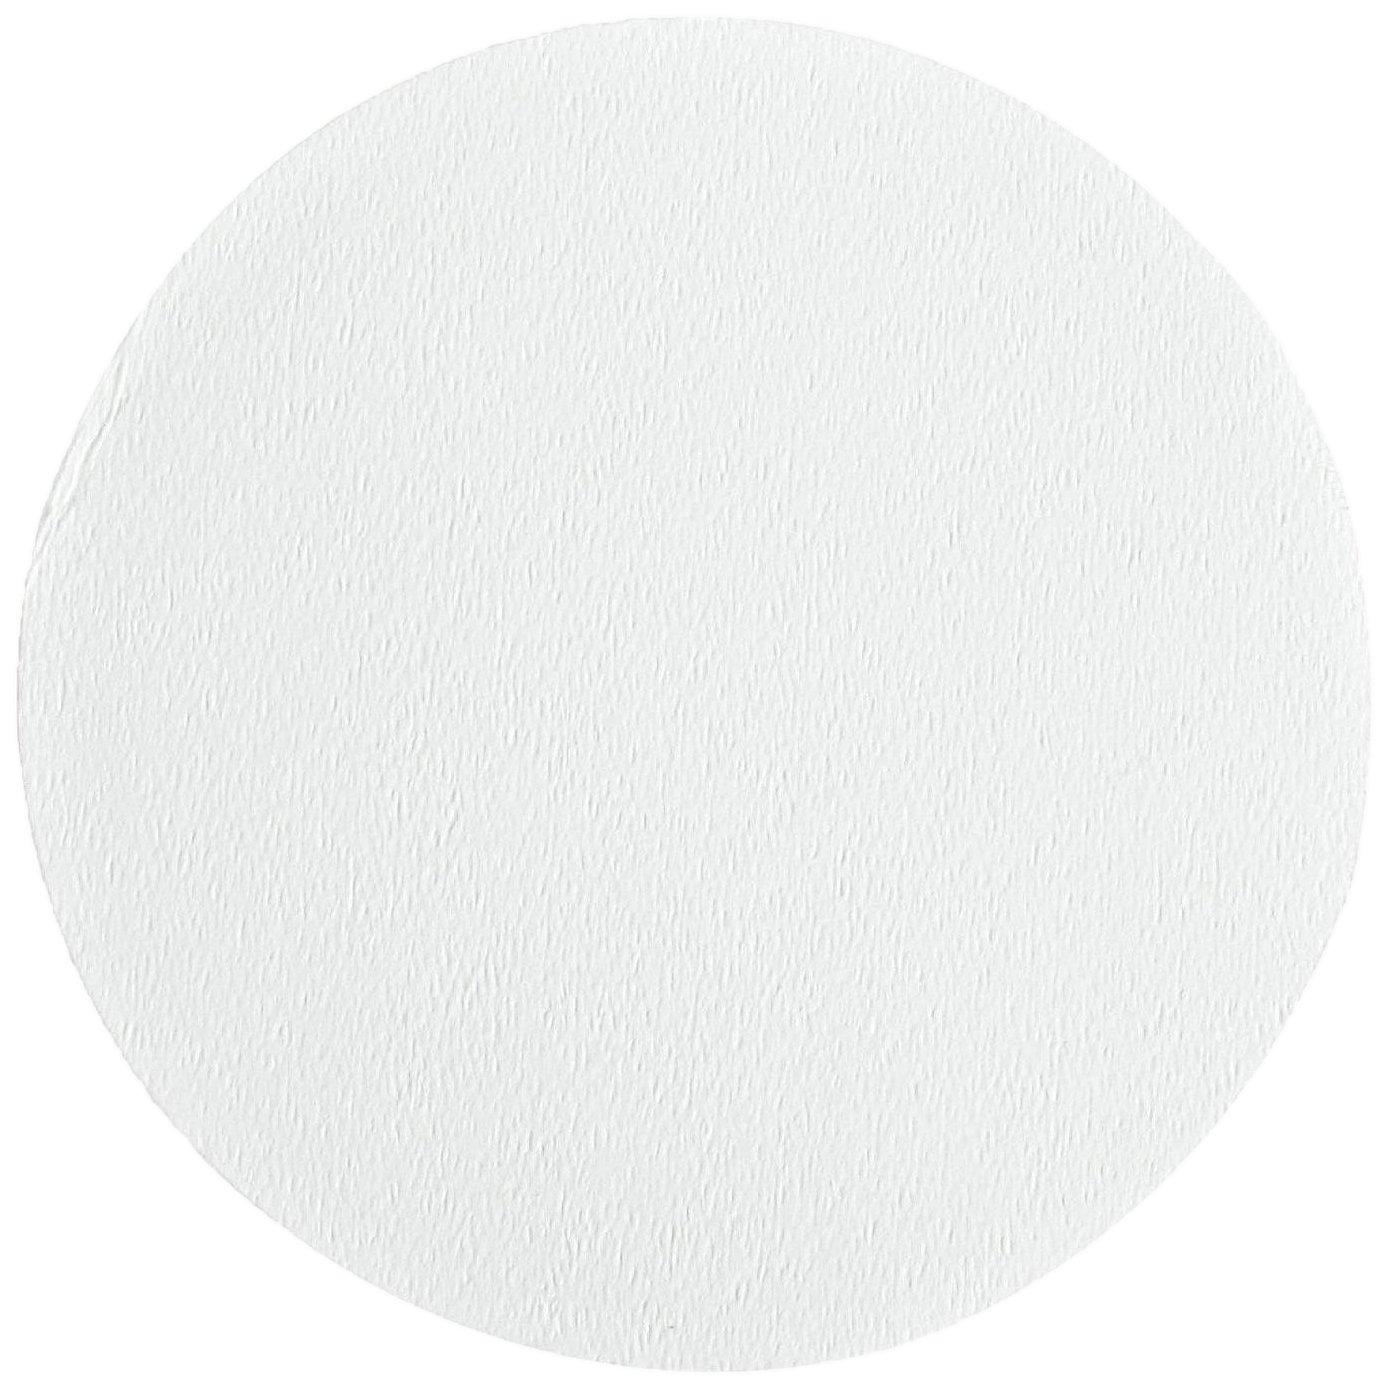 Ahlstrom 1510-0425 Borosilicate Glass Microfiber Filter Paper, 0.7 Micron, Slow Flow, Grade 151, 4.25cm Diameter (Box of 100)